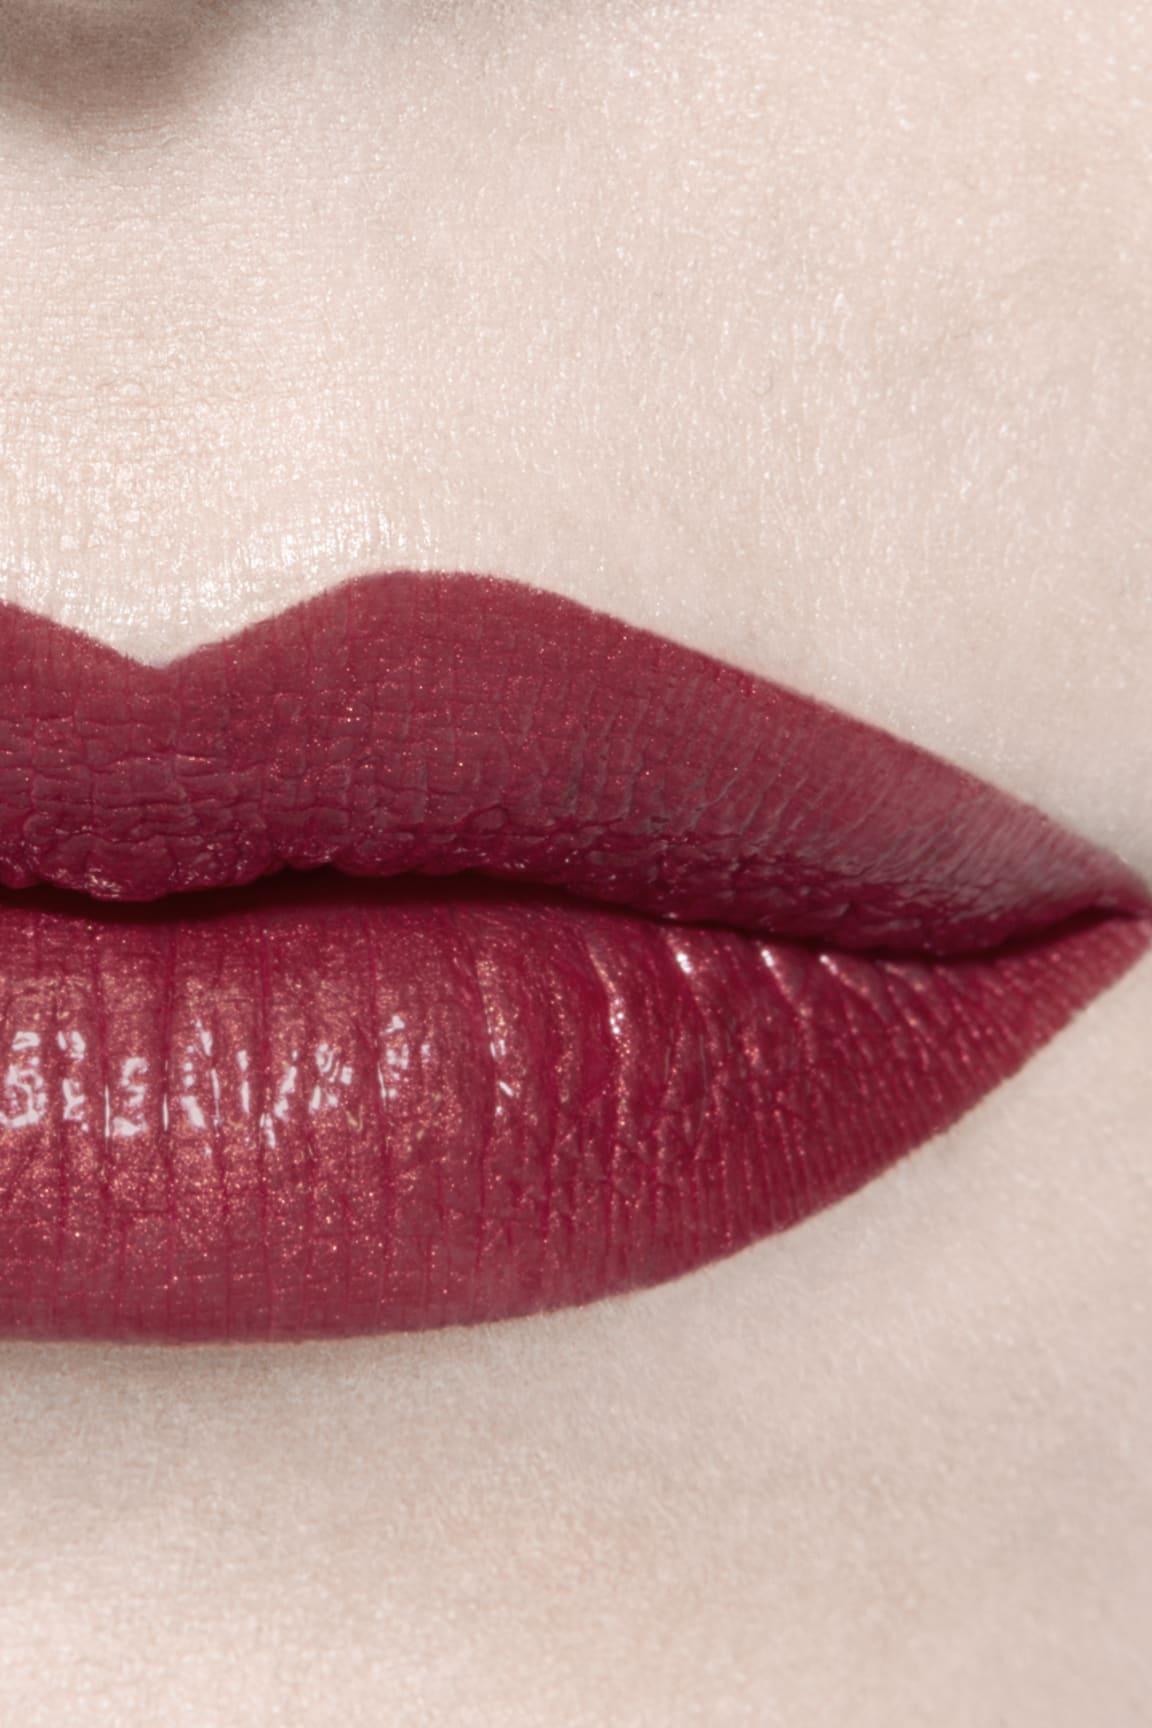 Application makeup visual 3 - ROUGE ALLURE LAQUE 77 - DARK BLOSSOM